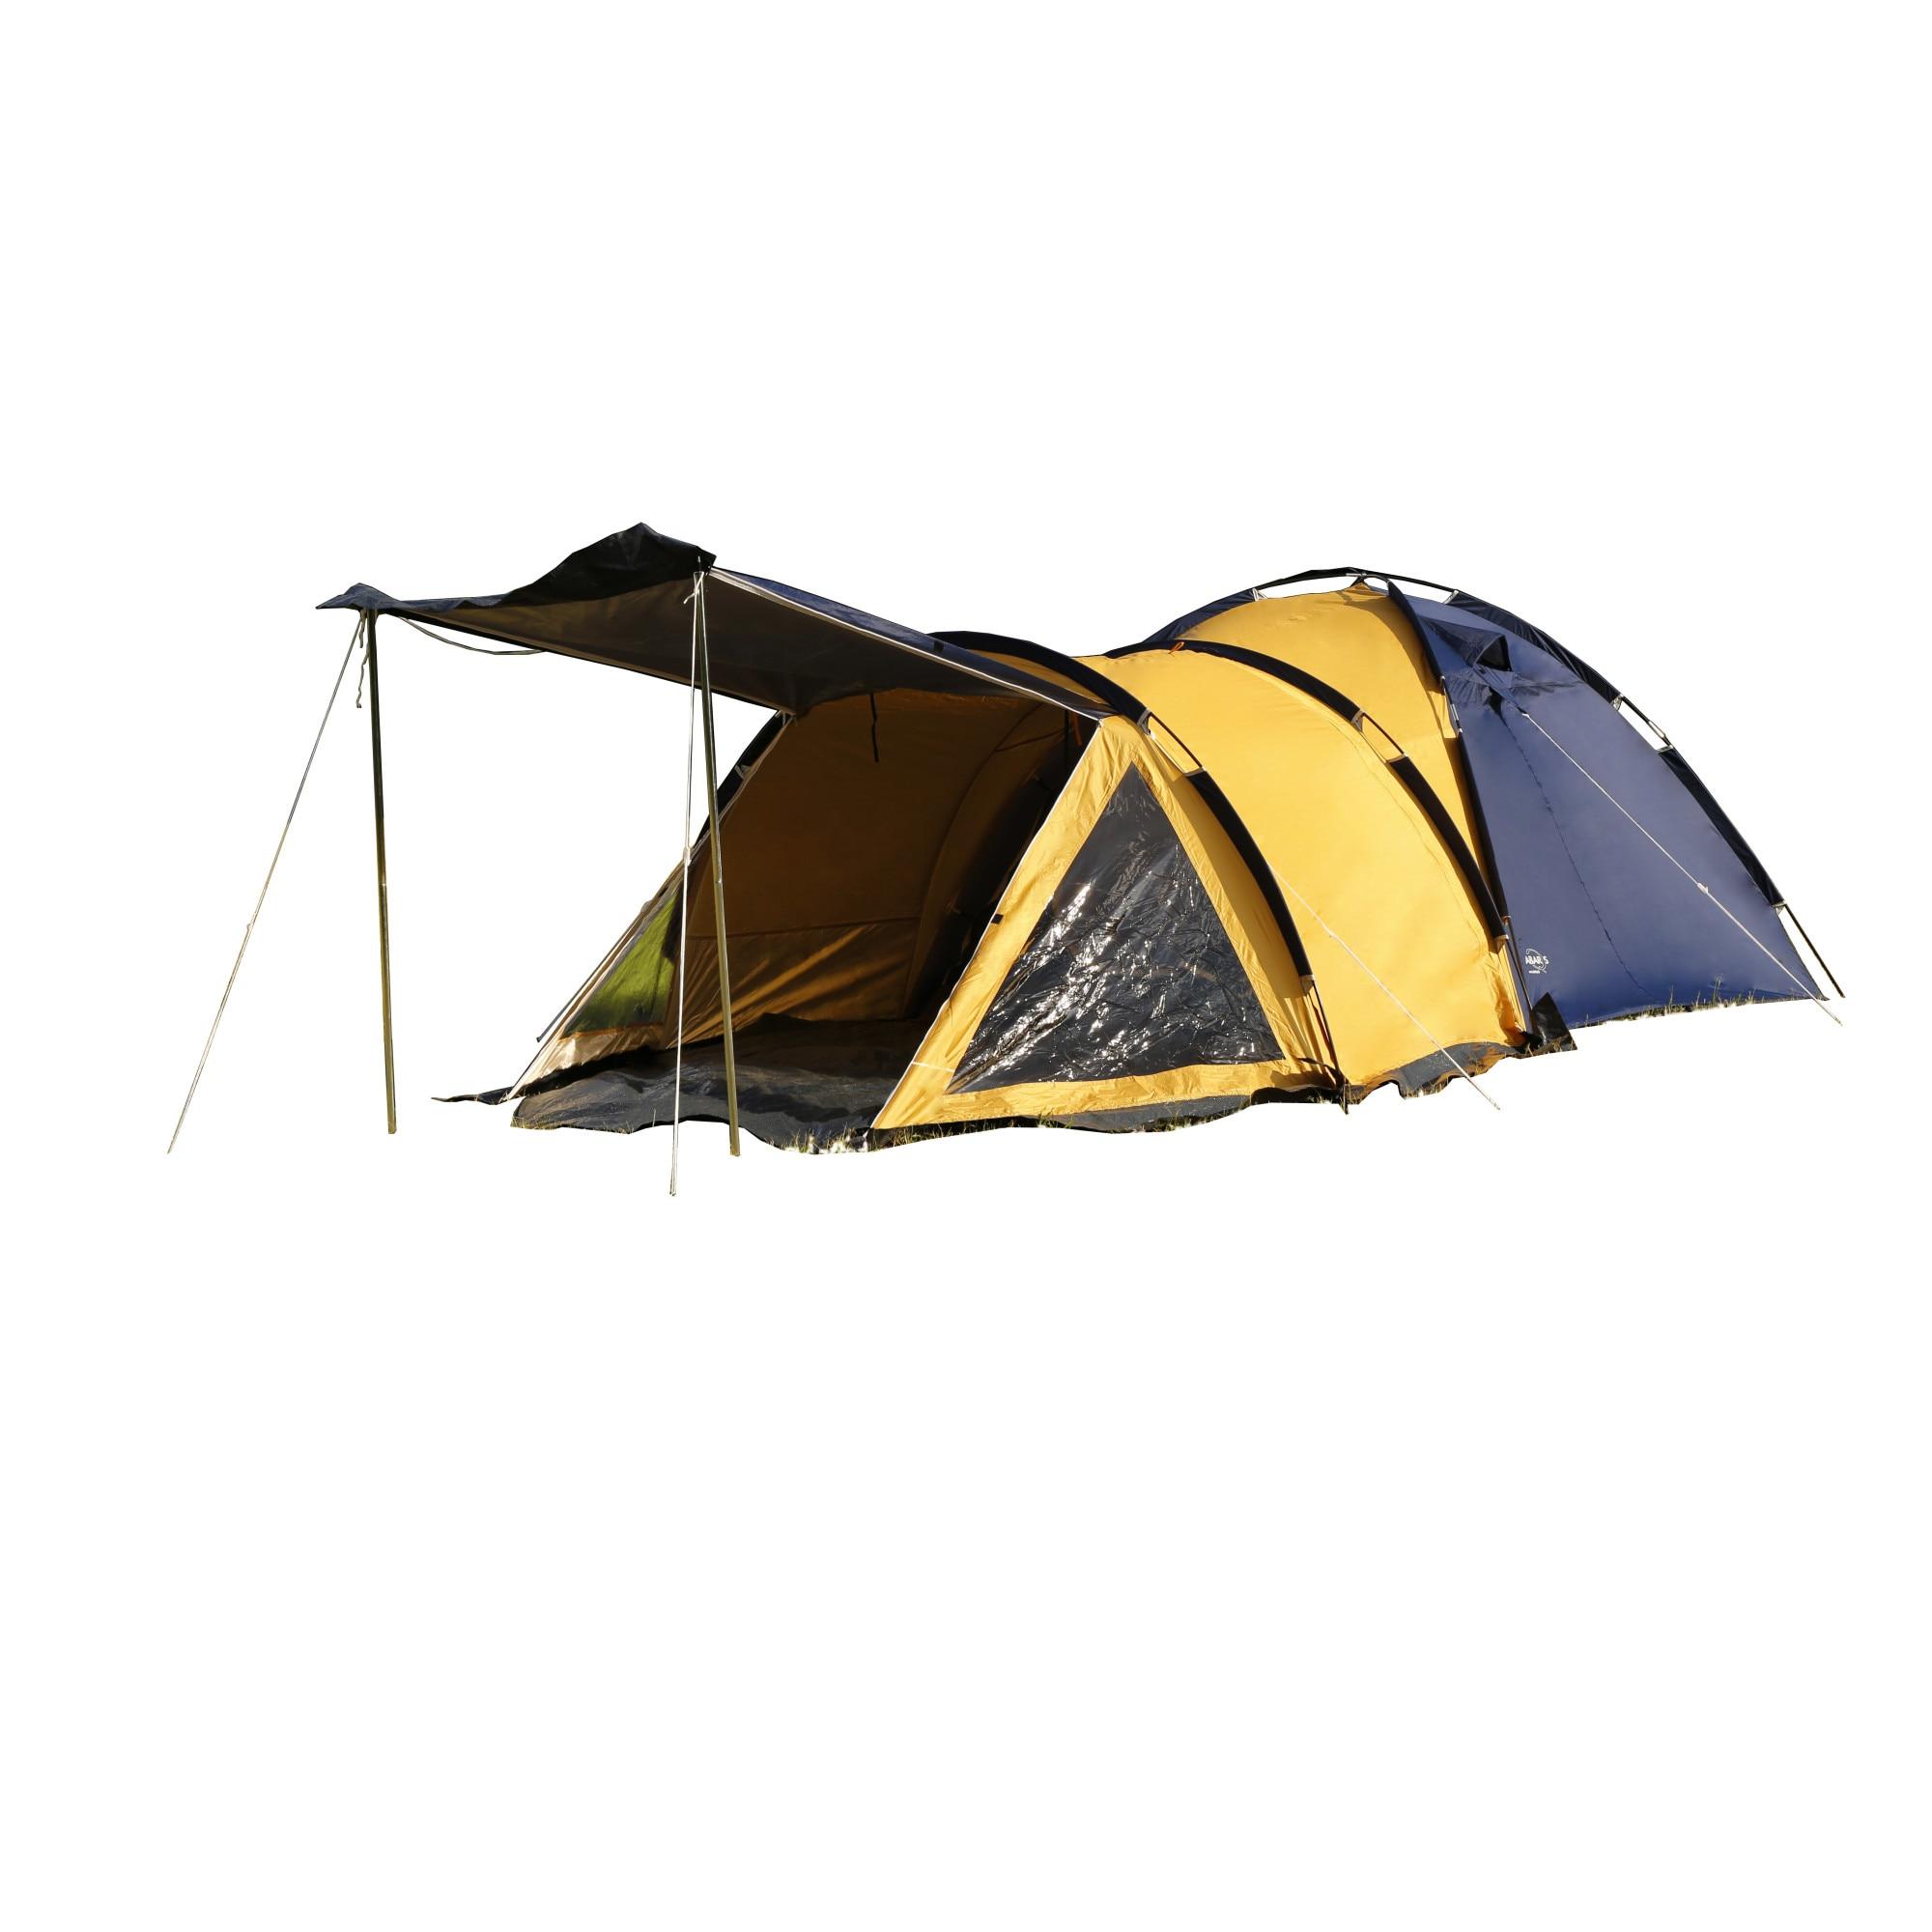 Namiot kempingowy Abarqs Traper 4, 4 os, niebieski